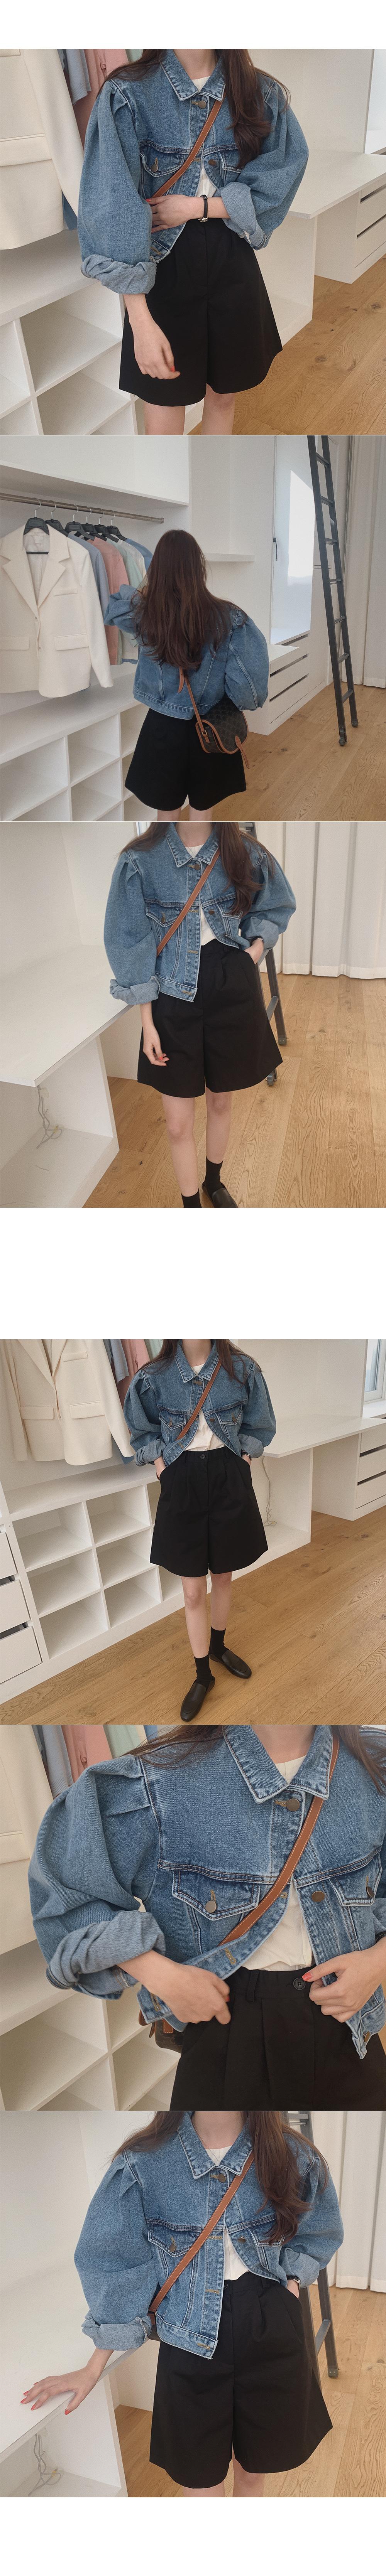 Normal denim jacket